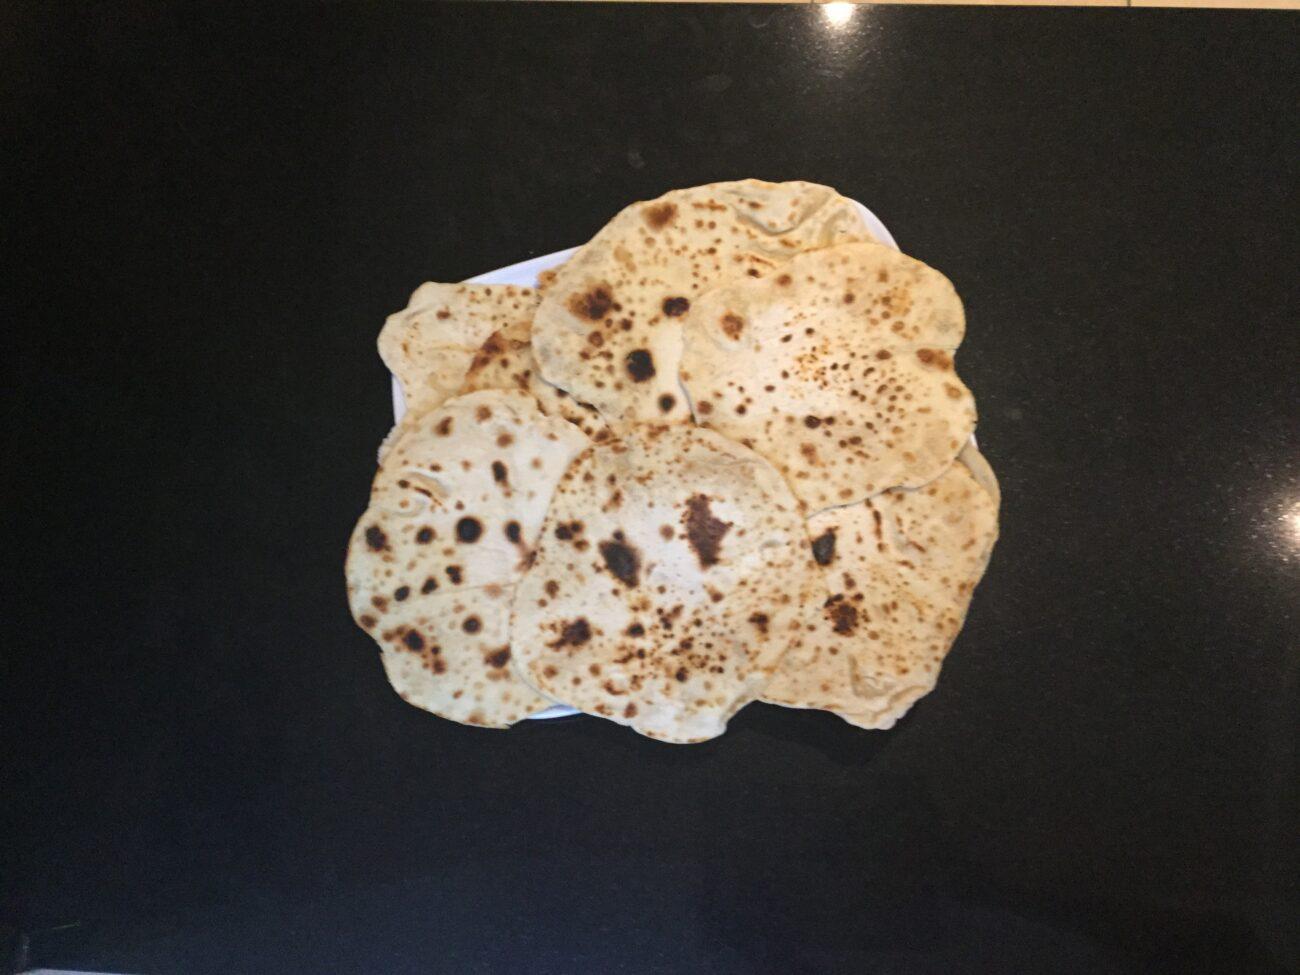 Roti recipe - side dish to accompany a curry